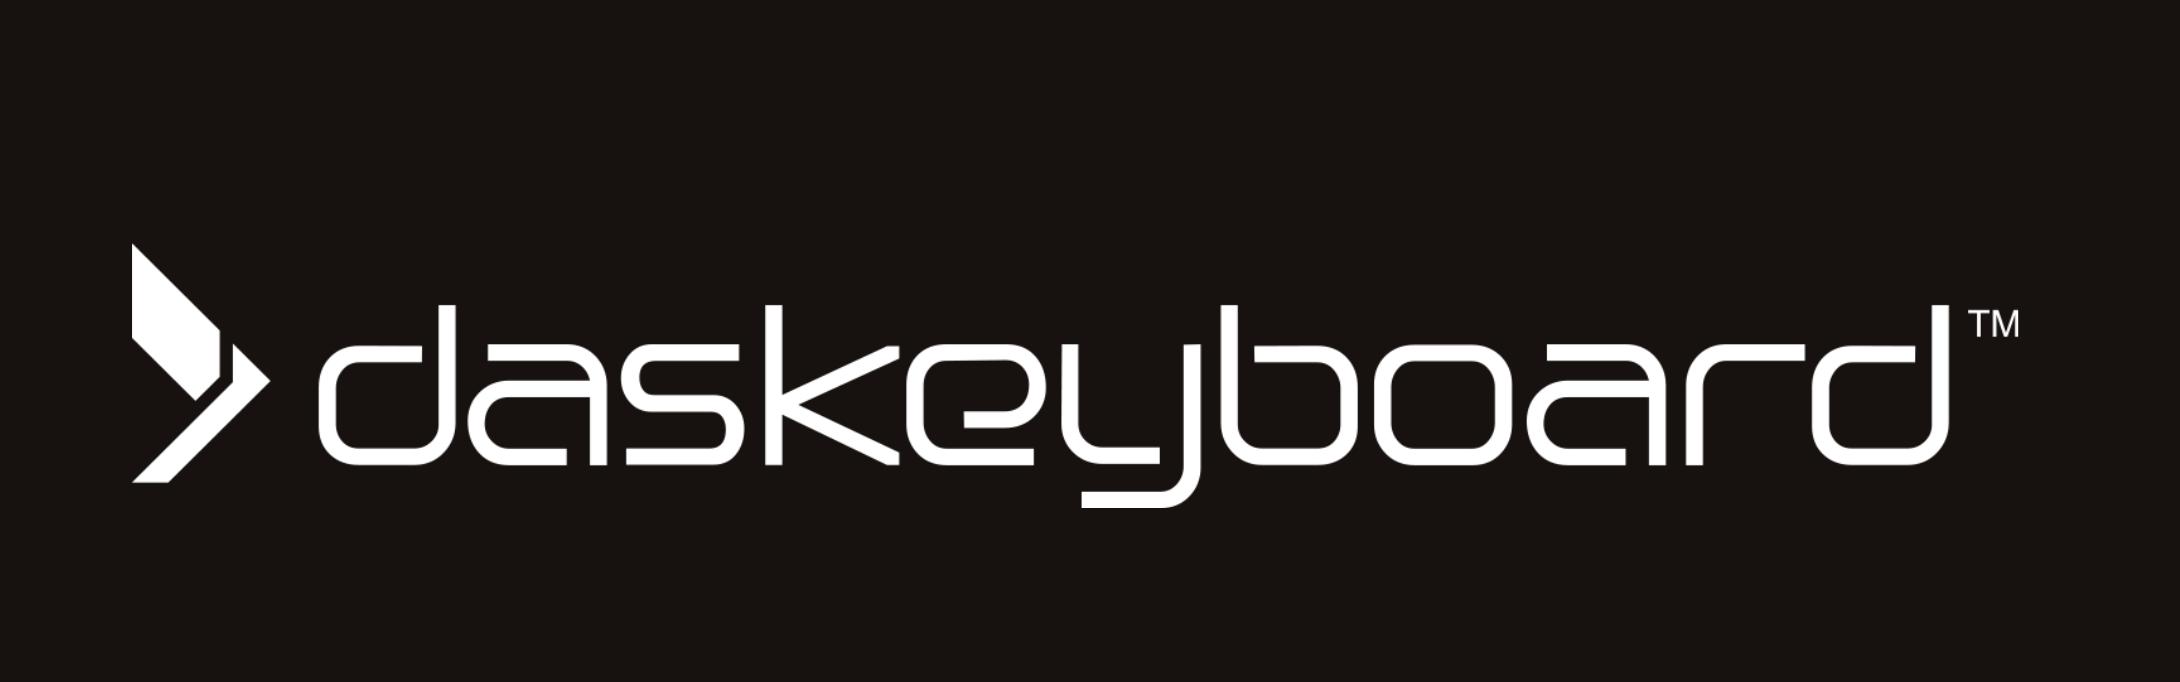 Das Keyboard Mechanical Keyboard Blog - Learn about keyboards ...